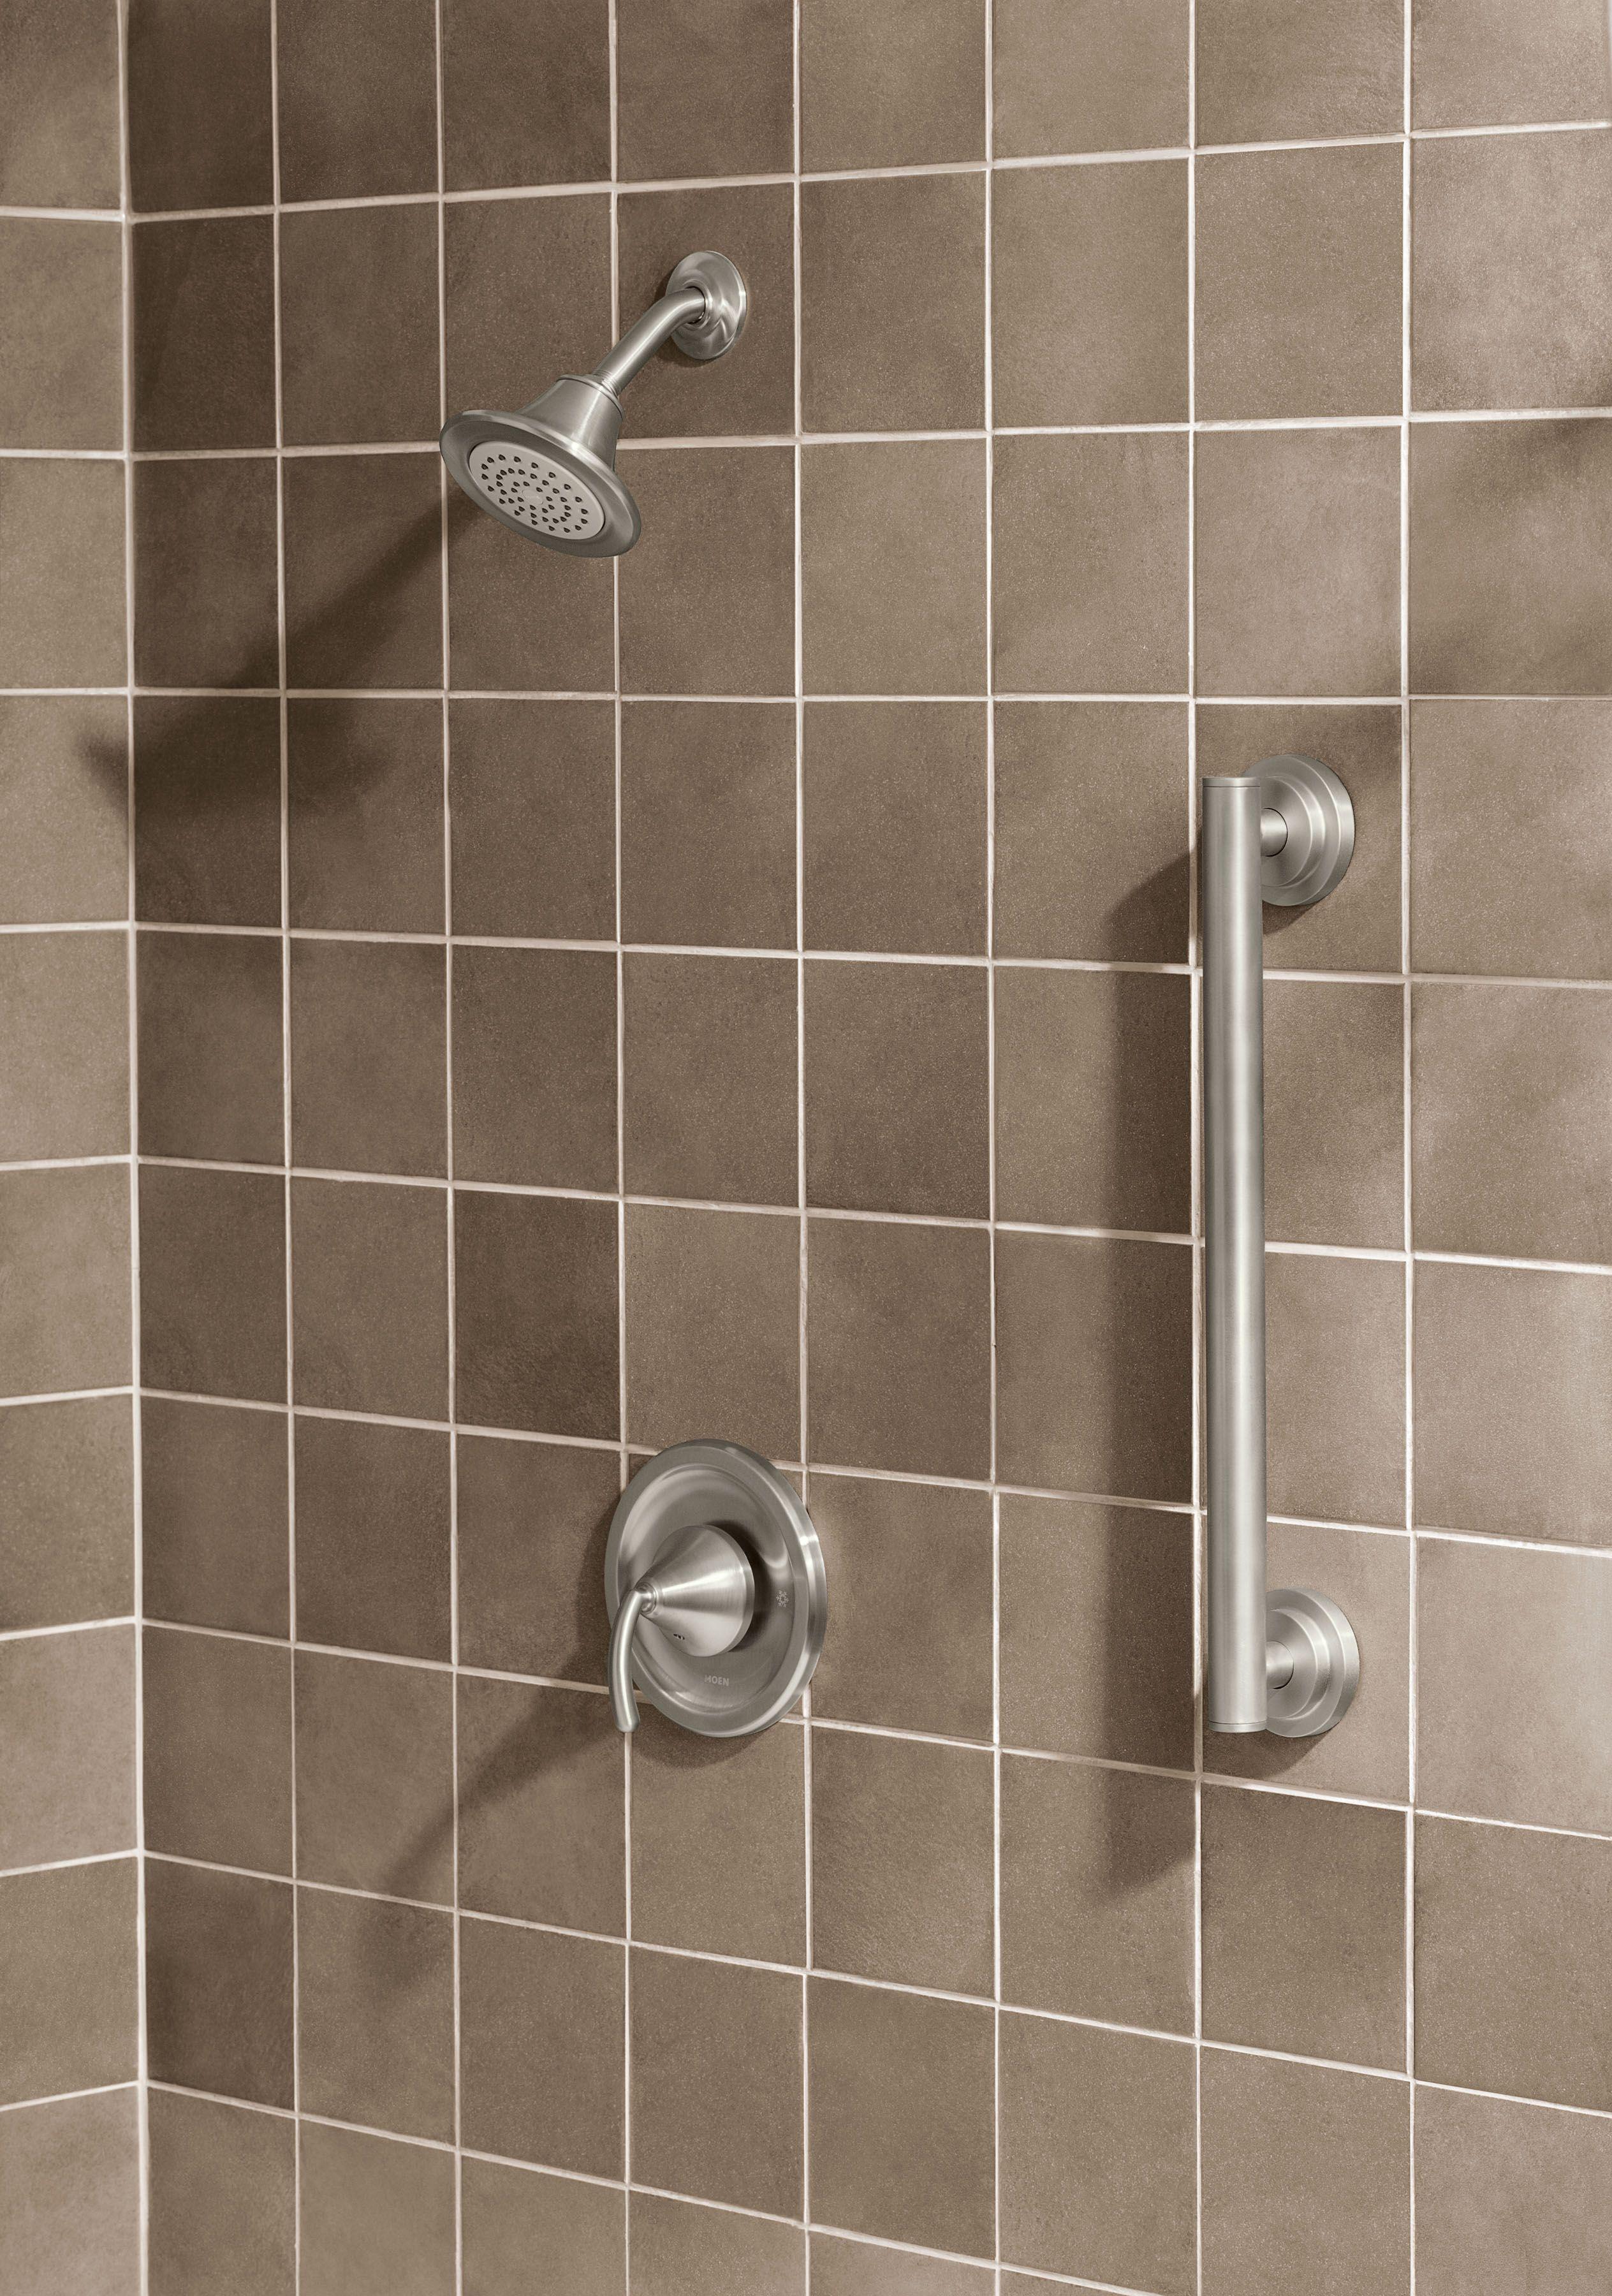 Shower Grab Bars Google Search Bathrooms Pinterest Bathroom